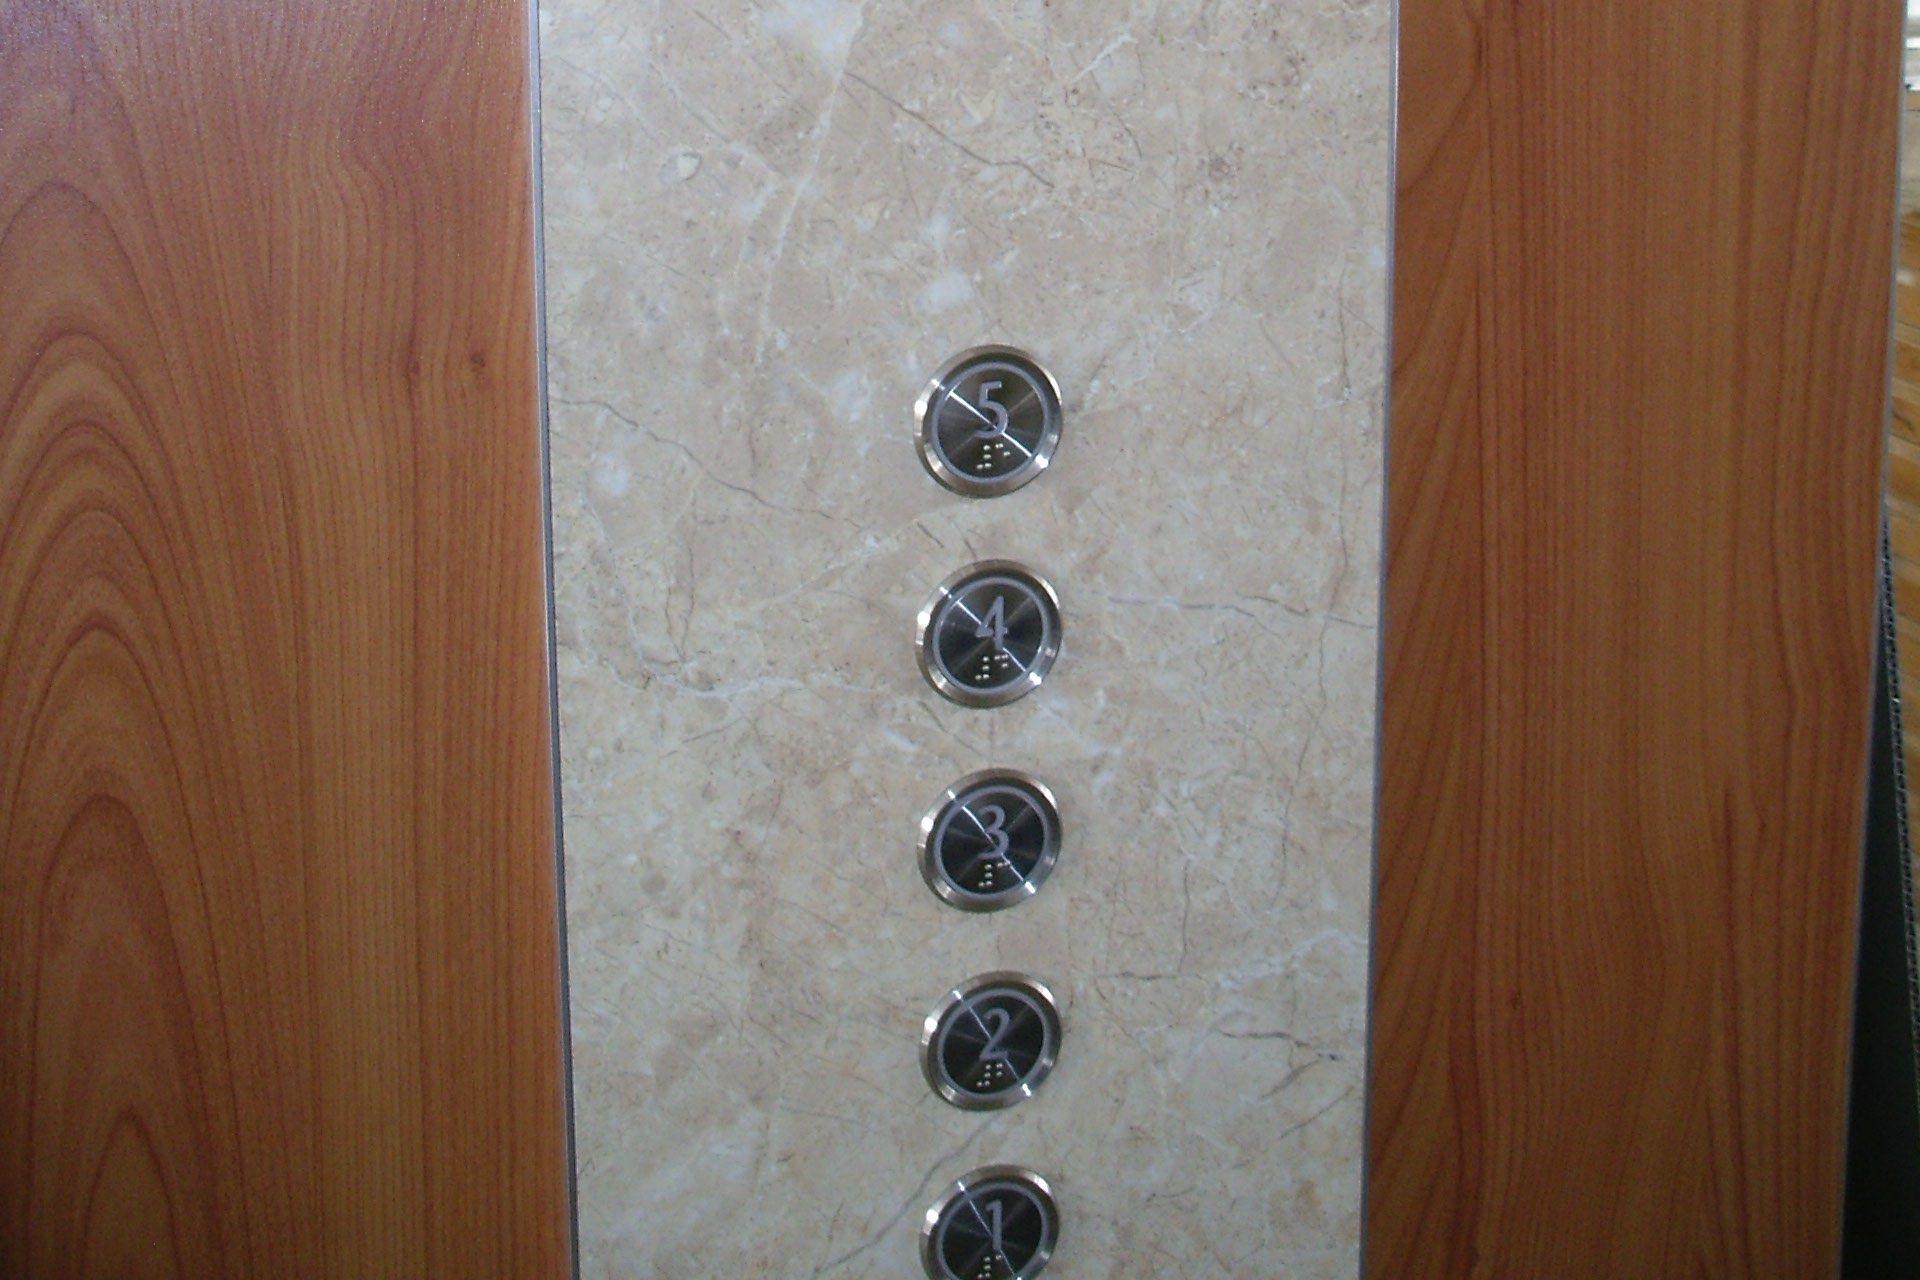 Ovladač ve výtahu, mramor a dřevo